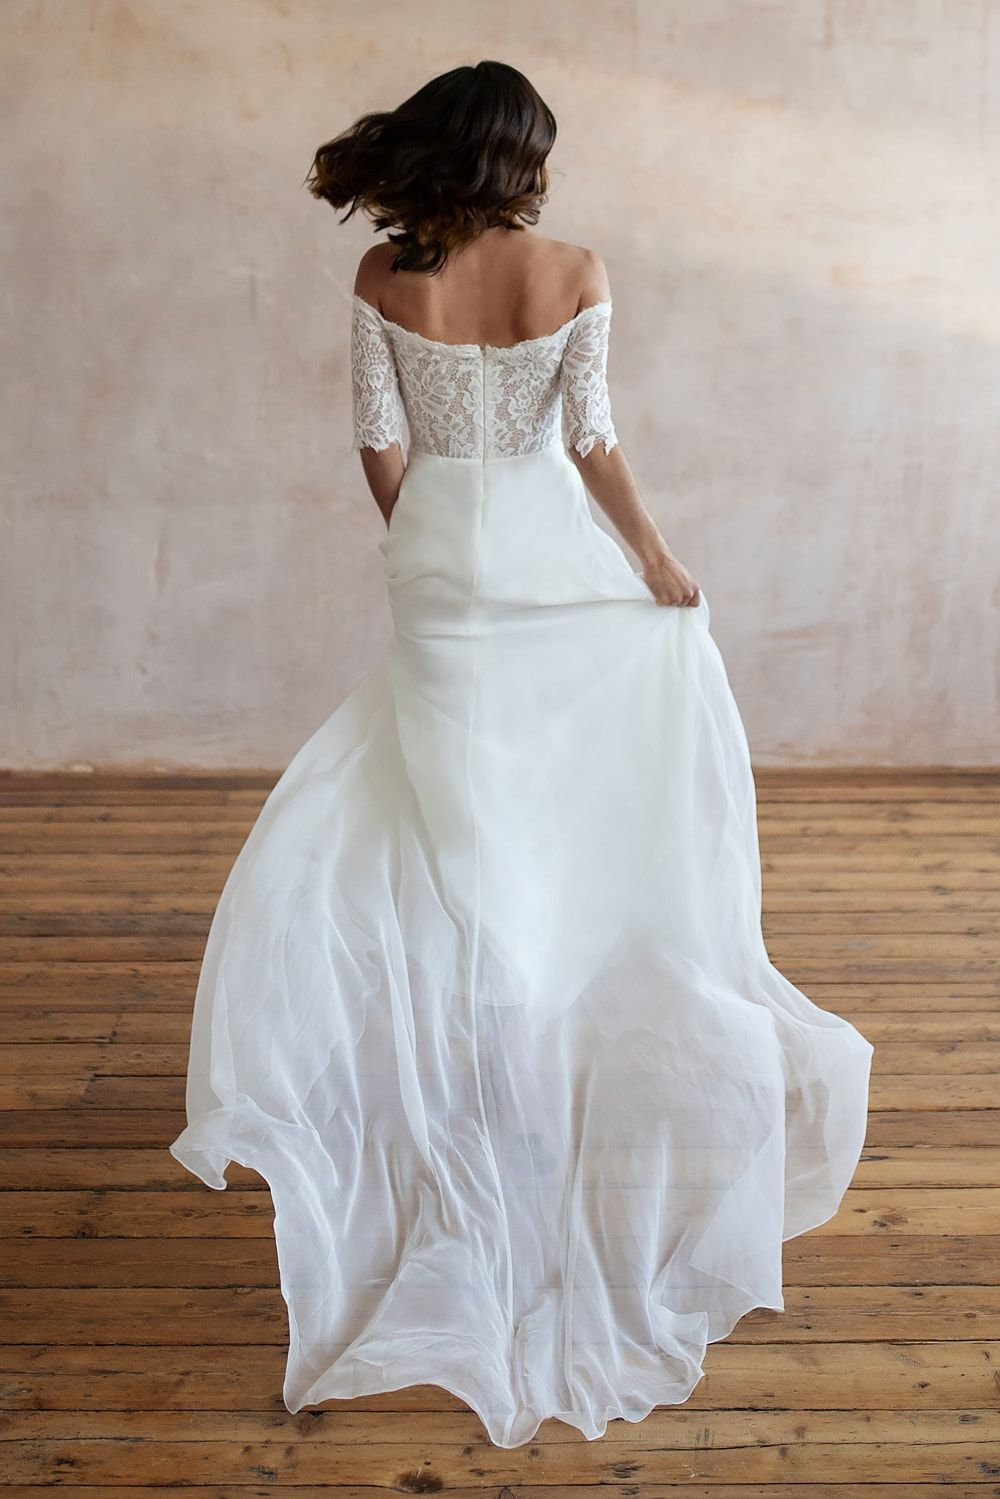 Boho Wedding Dresses Boho Wedding Dress Bridal Shops Near Me Wedding Dresses Lace Lace Wedding Dresses Wedding Dress Lace Lace Wedding Dress Wedding Dresses 16 4